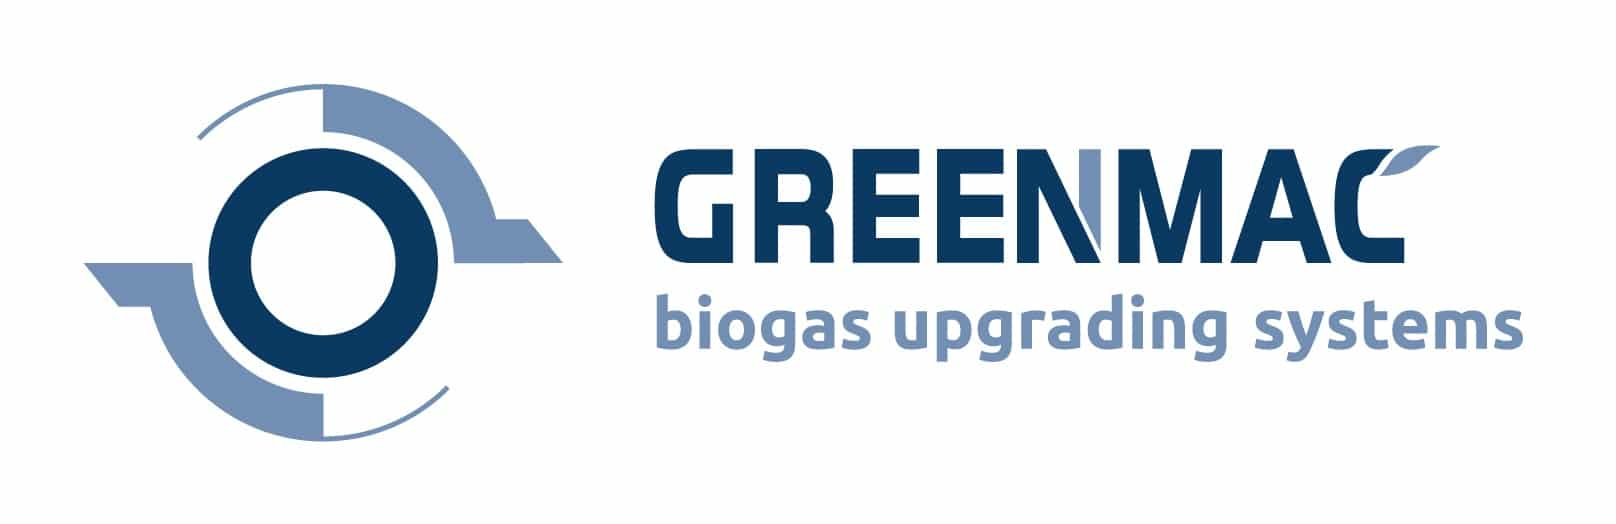 logo Greenmac-logo13022020